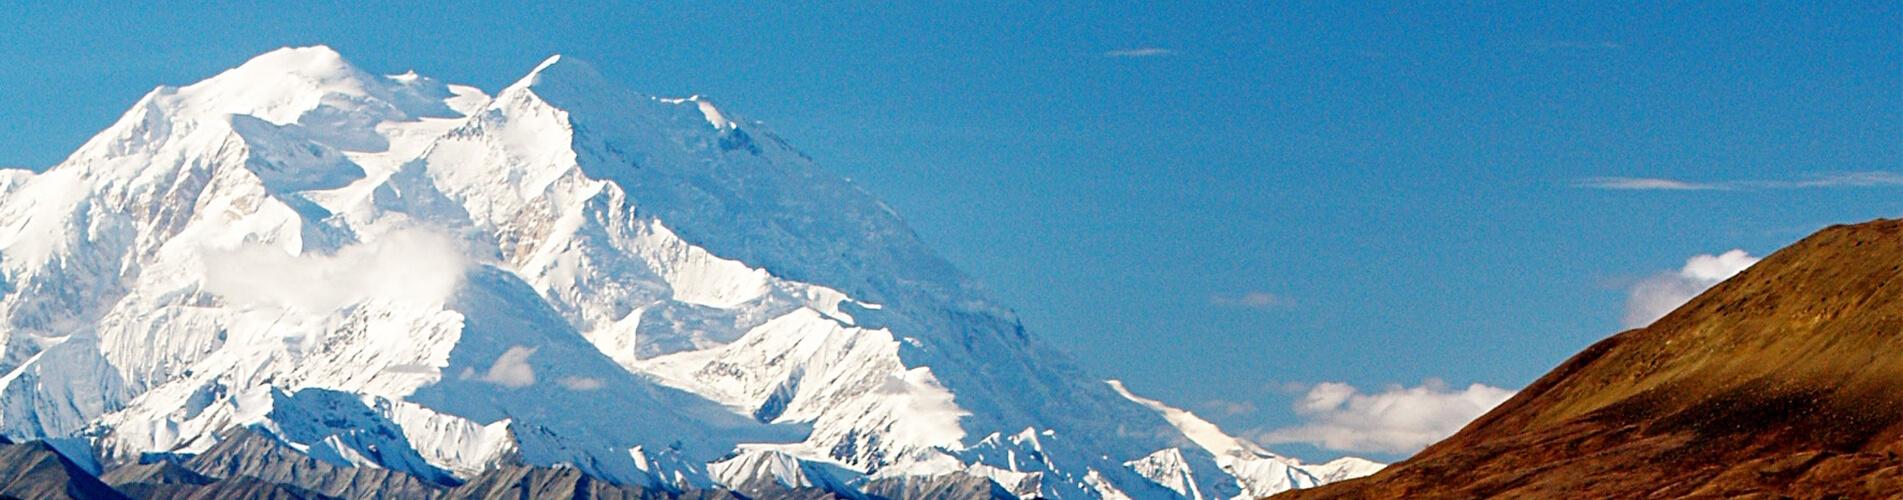 "Discover Denali National Park<br><span class=""title-sm"">Alaska</span>"